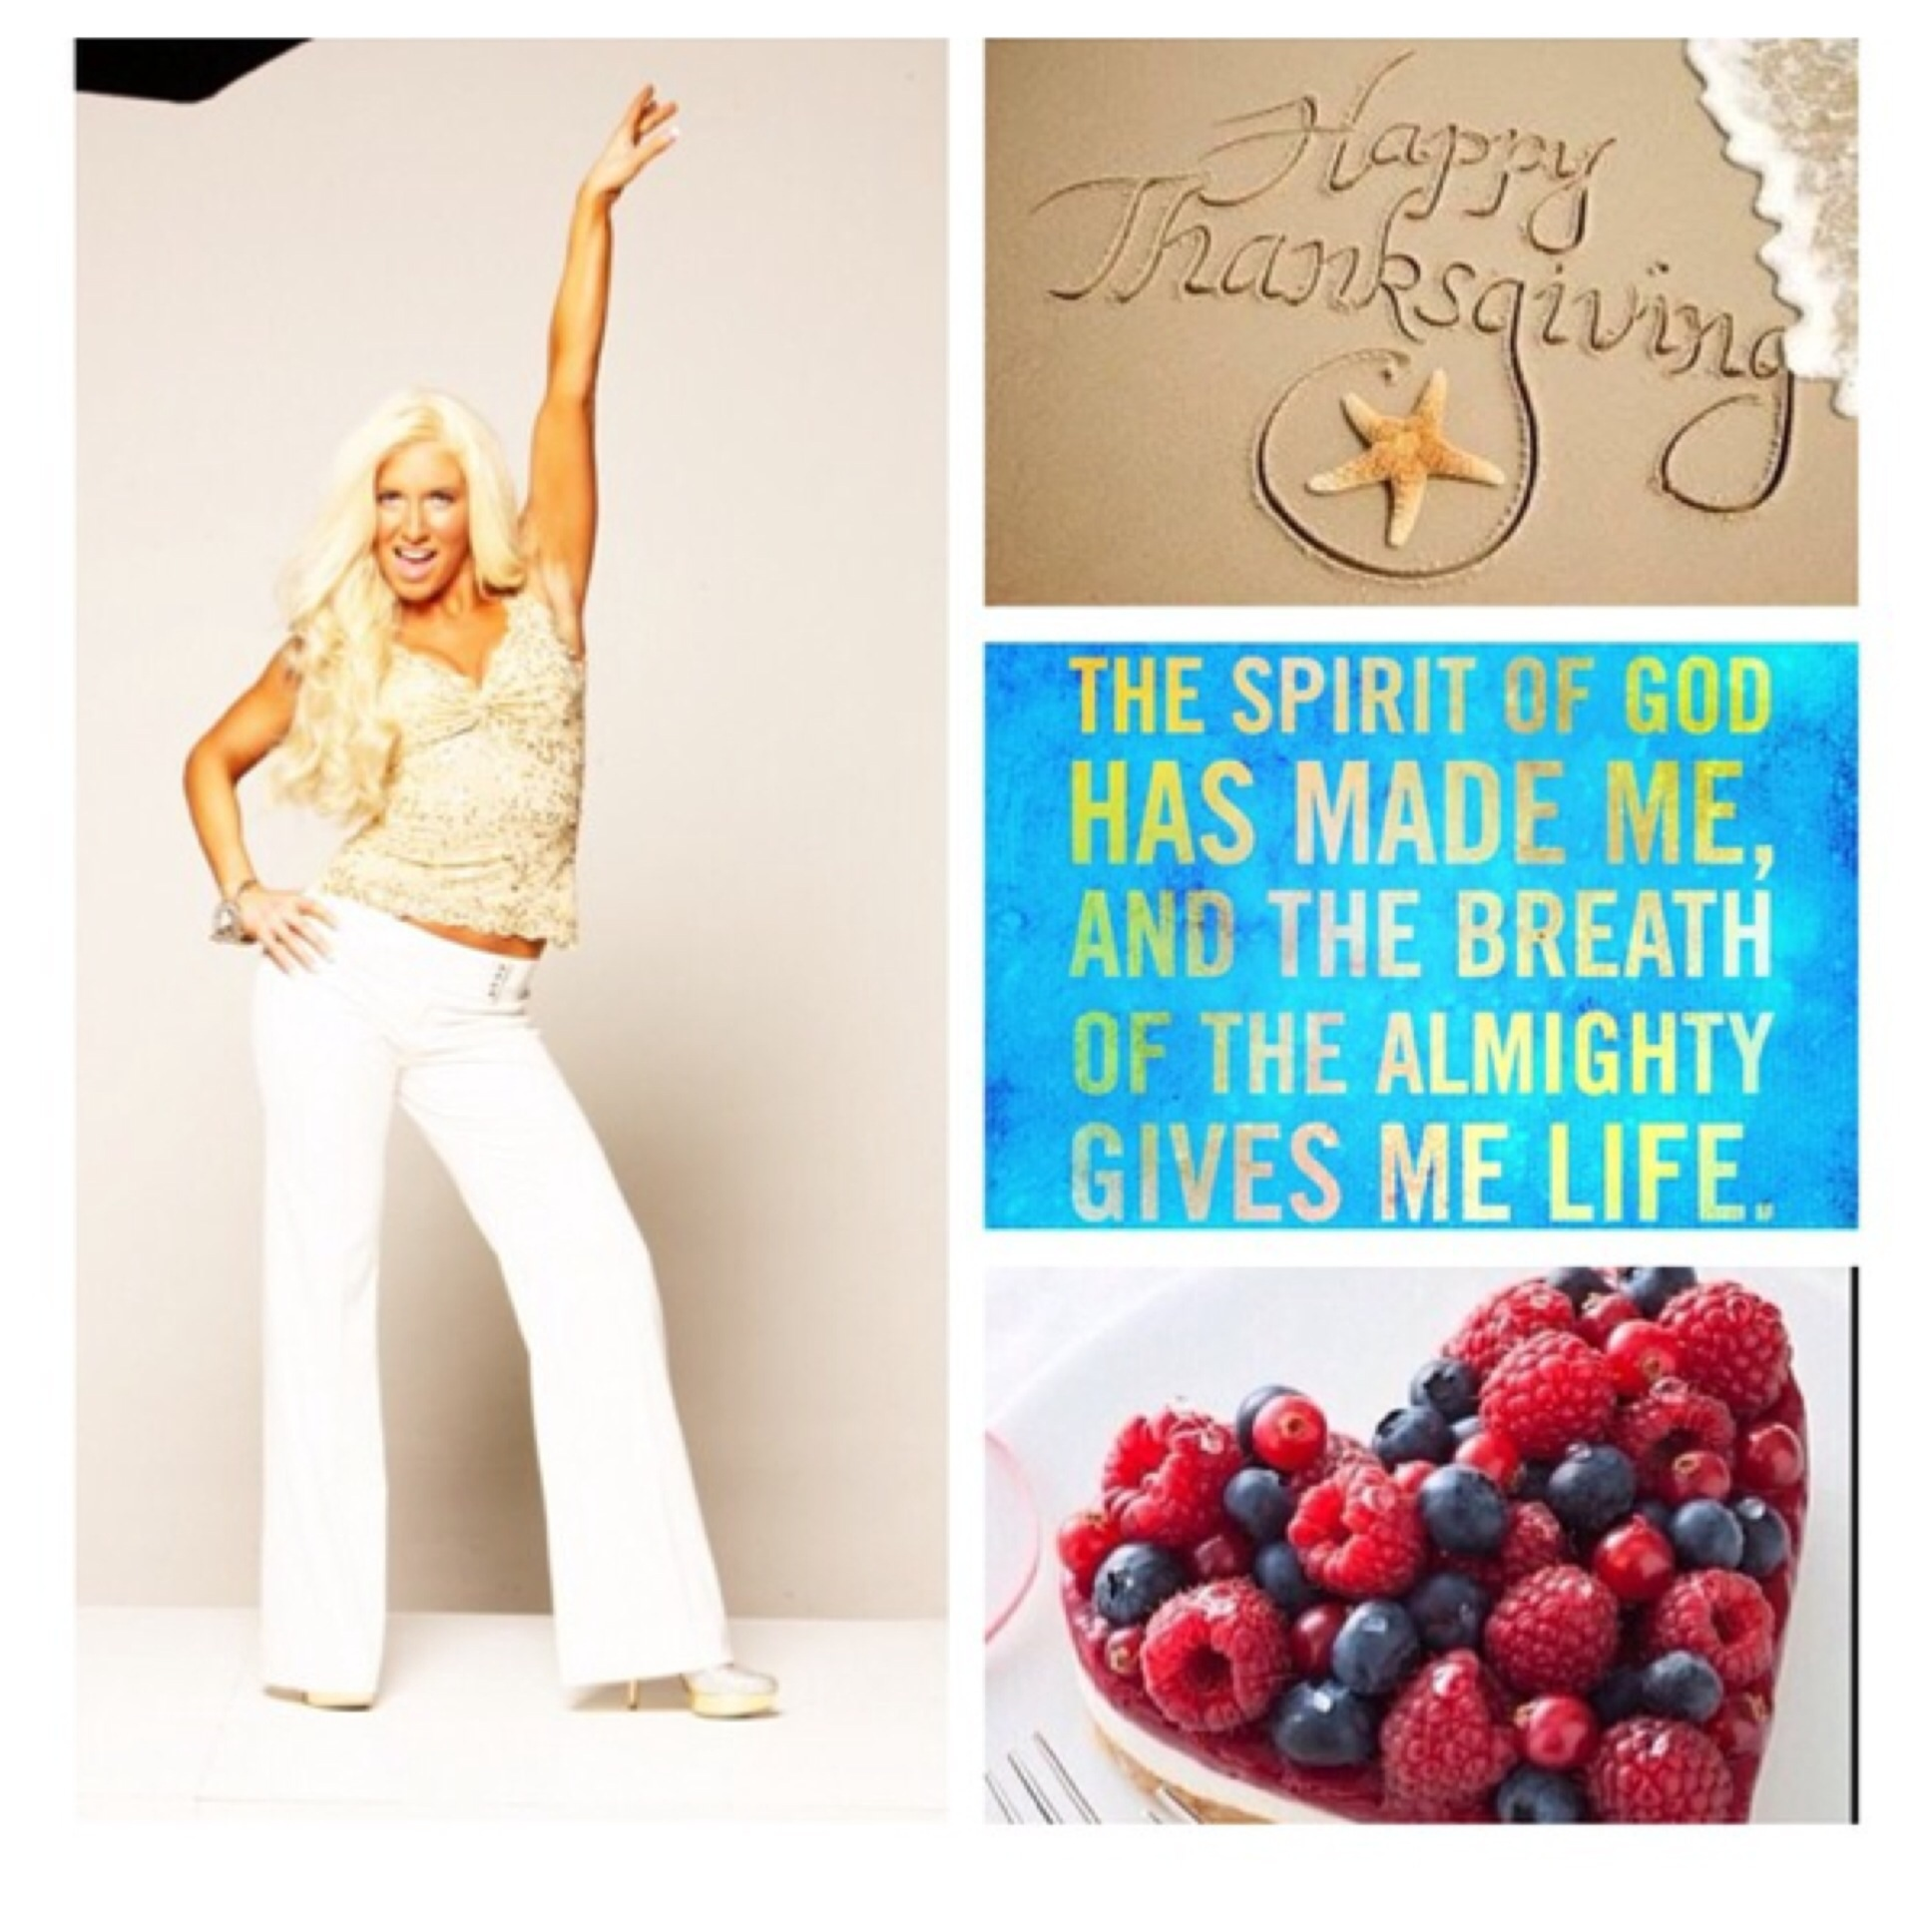 Shawn Rene Zimmerman celebrity health fitness expert fitness model tv magazines motivational Ralph Lauren fashion